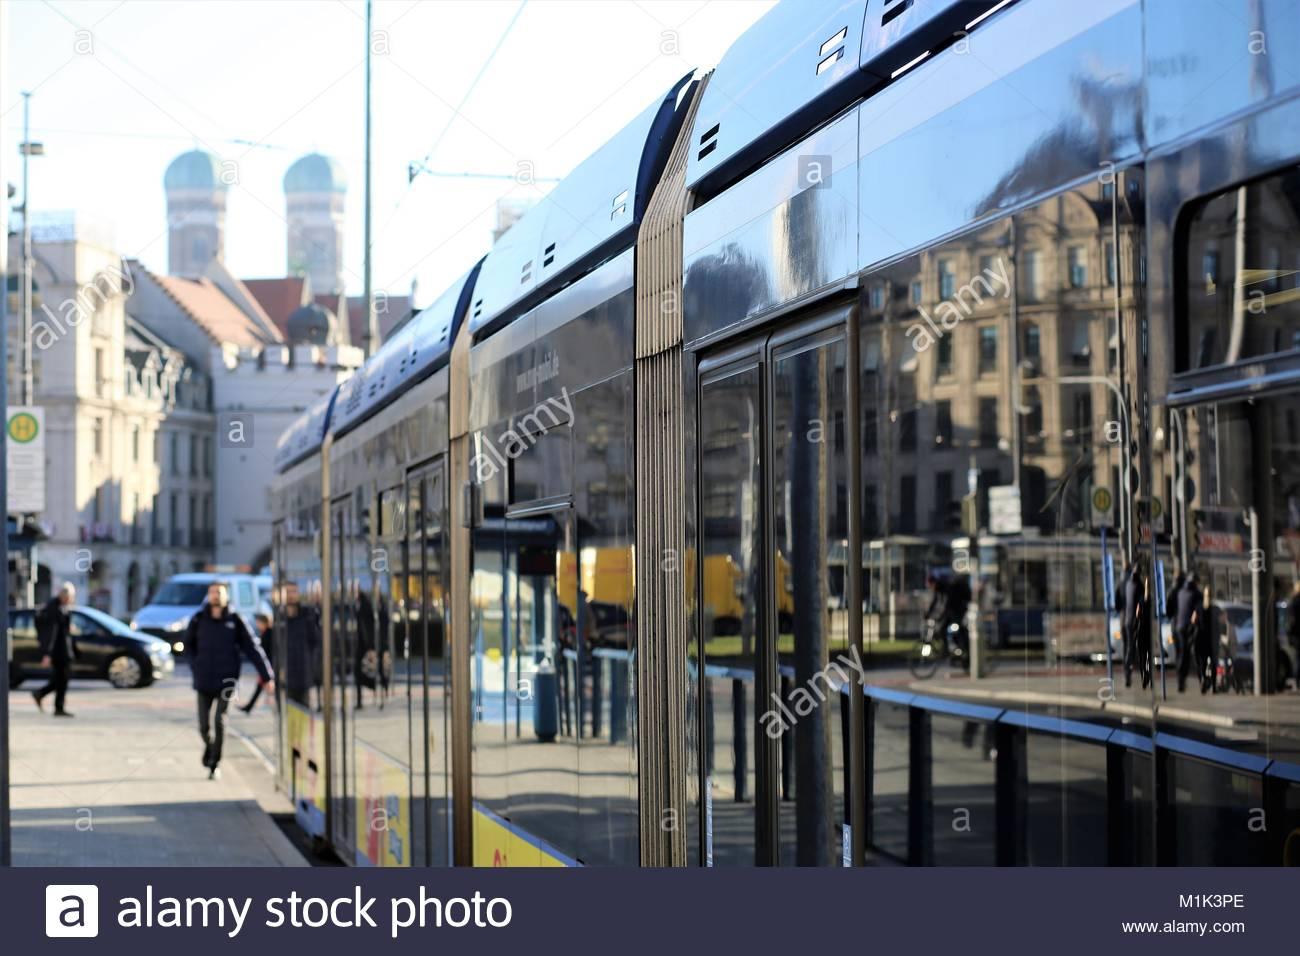 be7c5e6c77f1fa Train Window Man Reflection Stock Photos   Train Window Man ...